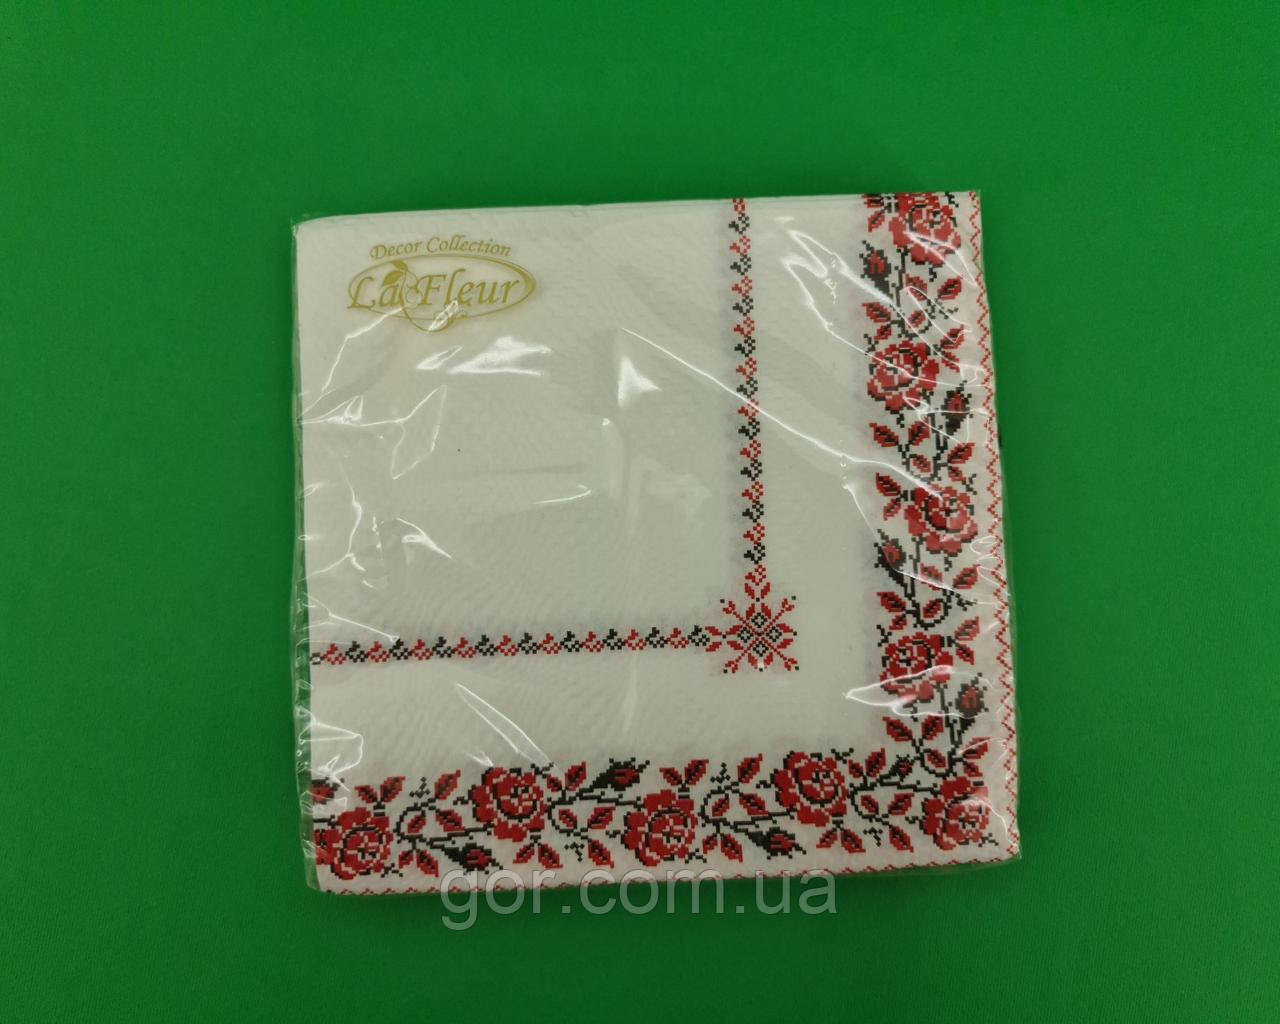 Салфетка декор (ЗЗхЗЗ, 20шт)  La Fleur Платок из роз (1311) (1 пач)